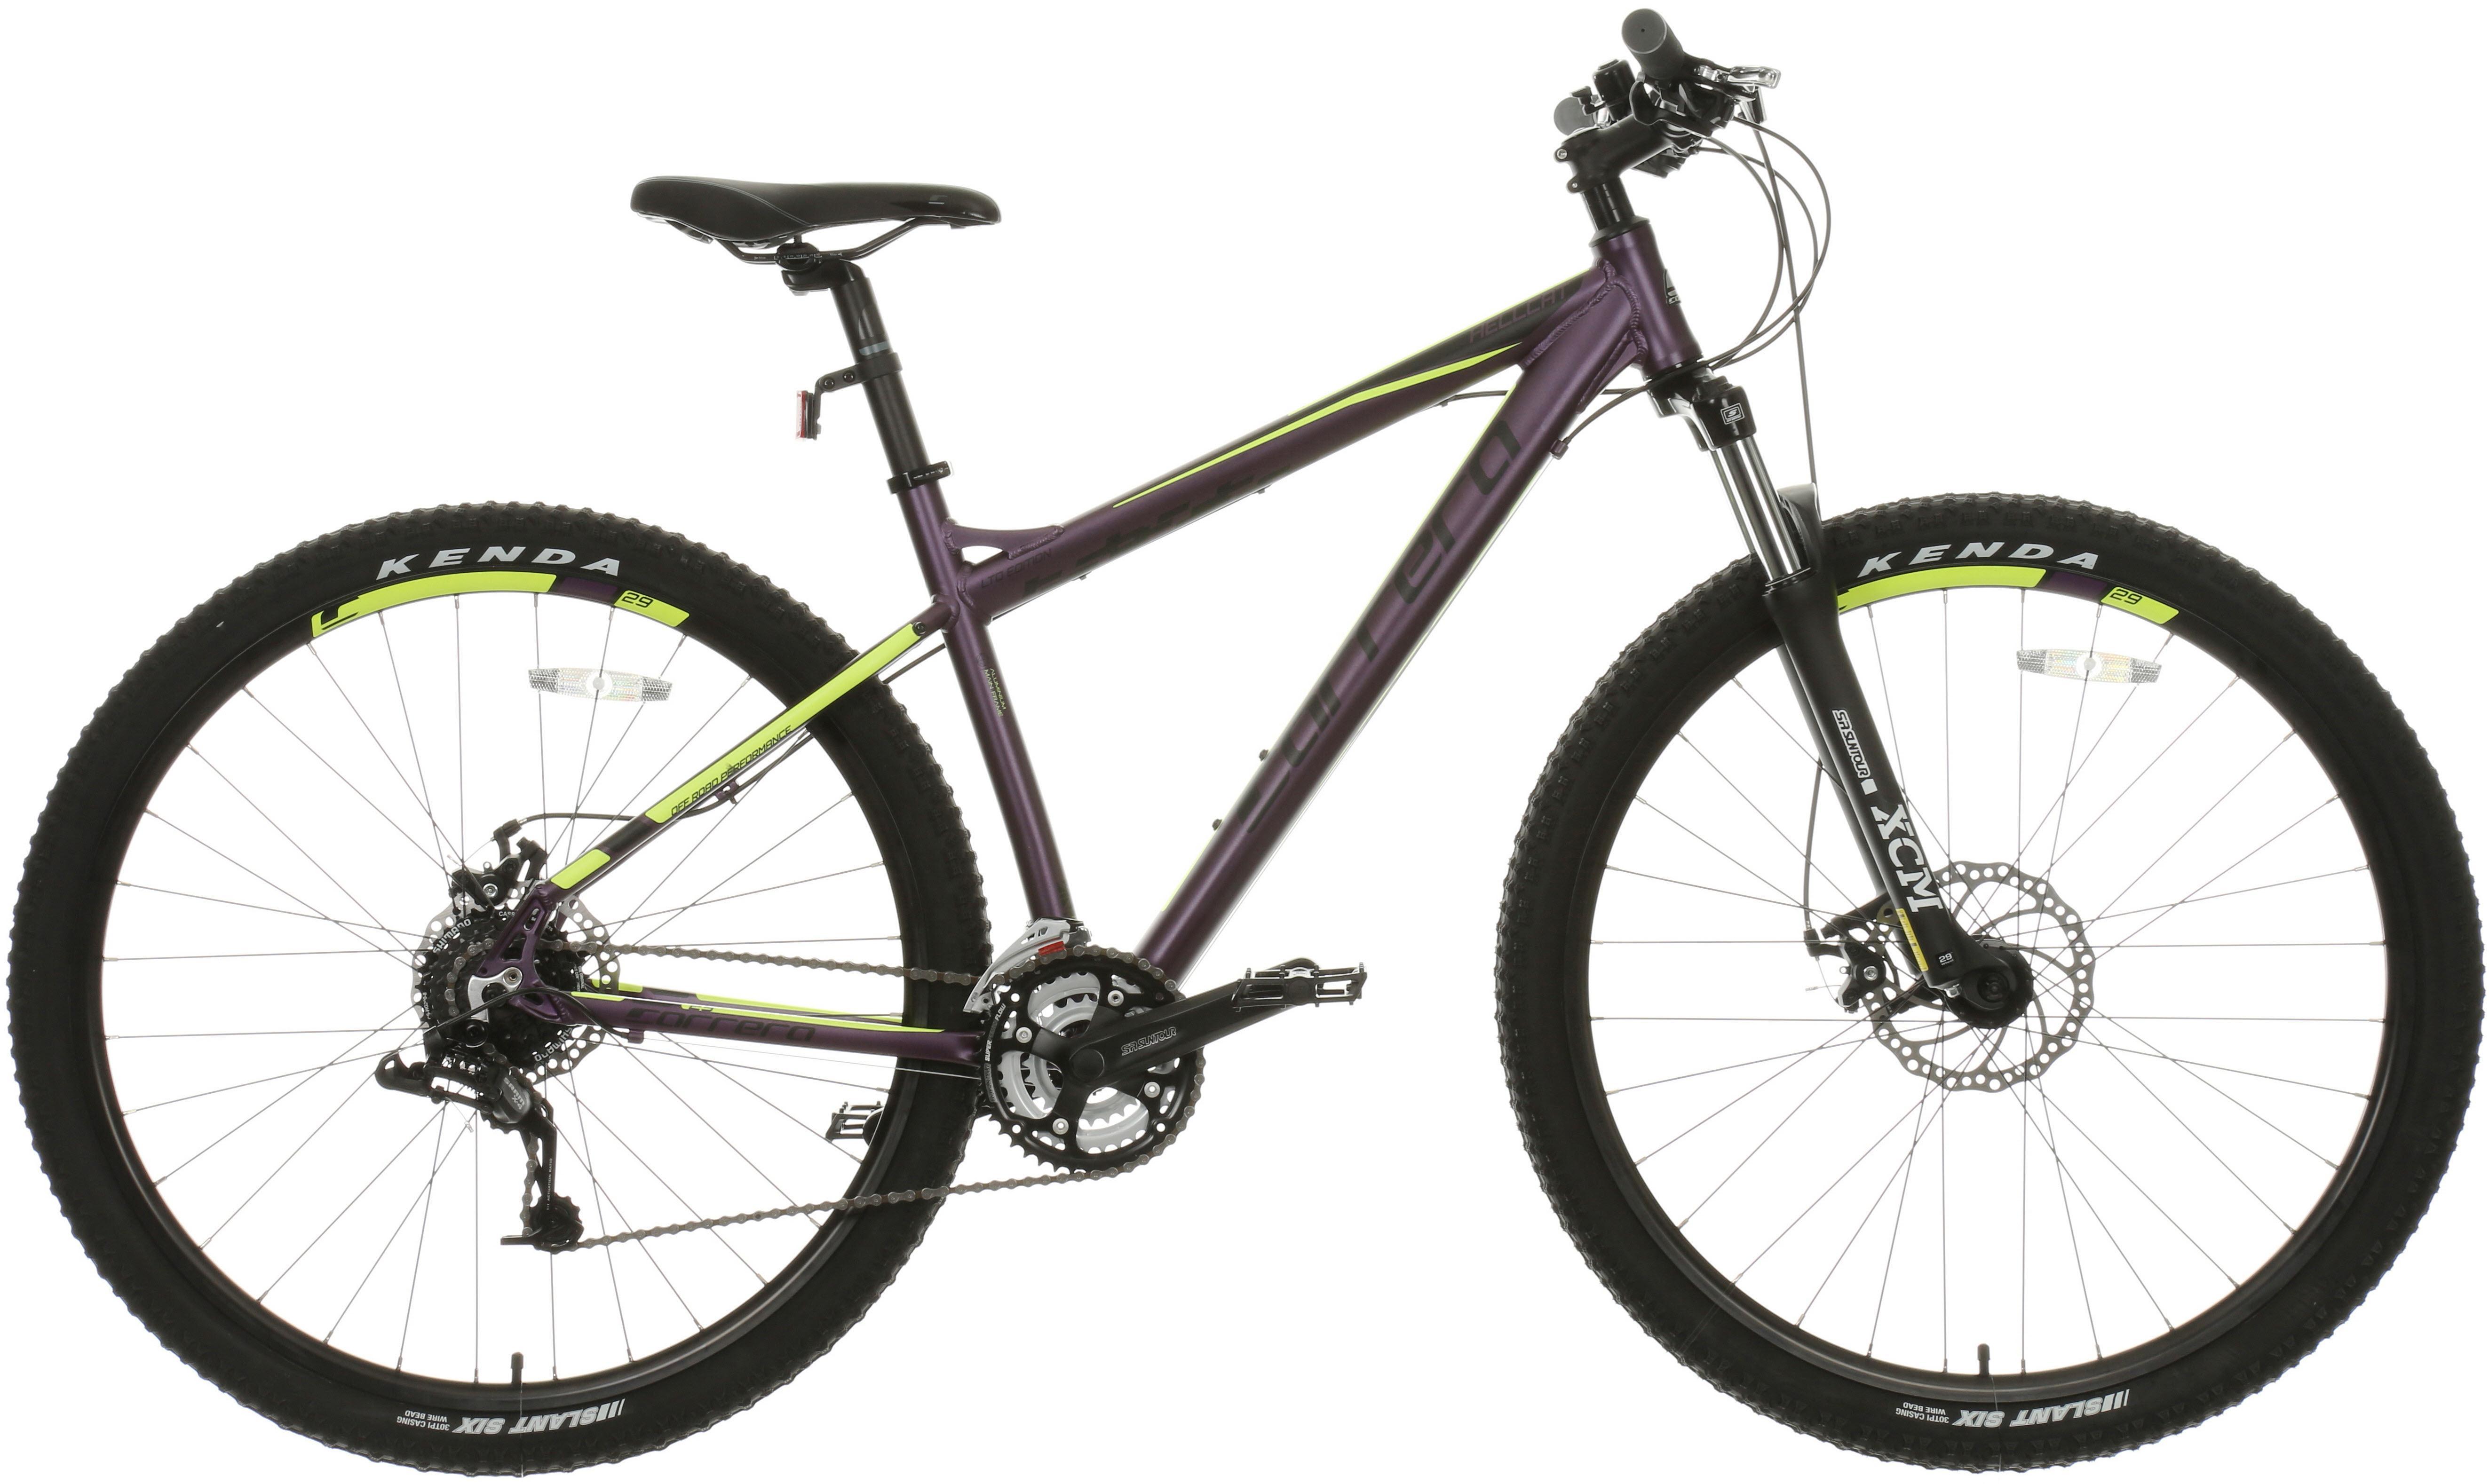 Carrera Mountain Bikes Ebay